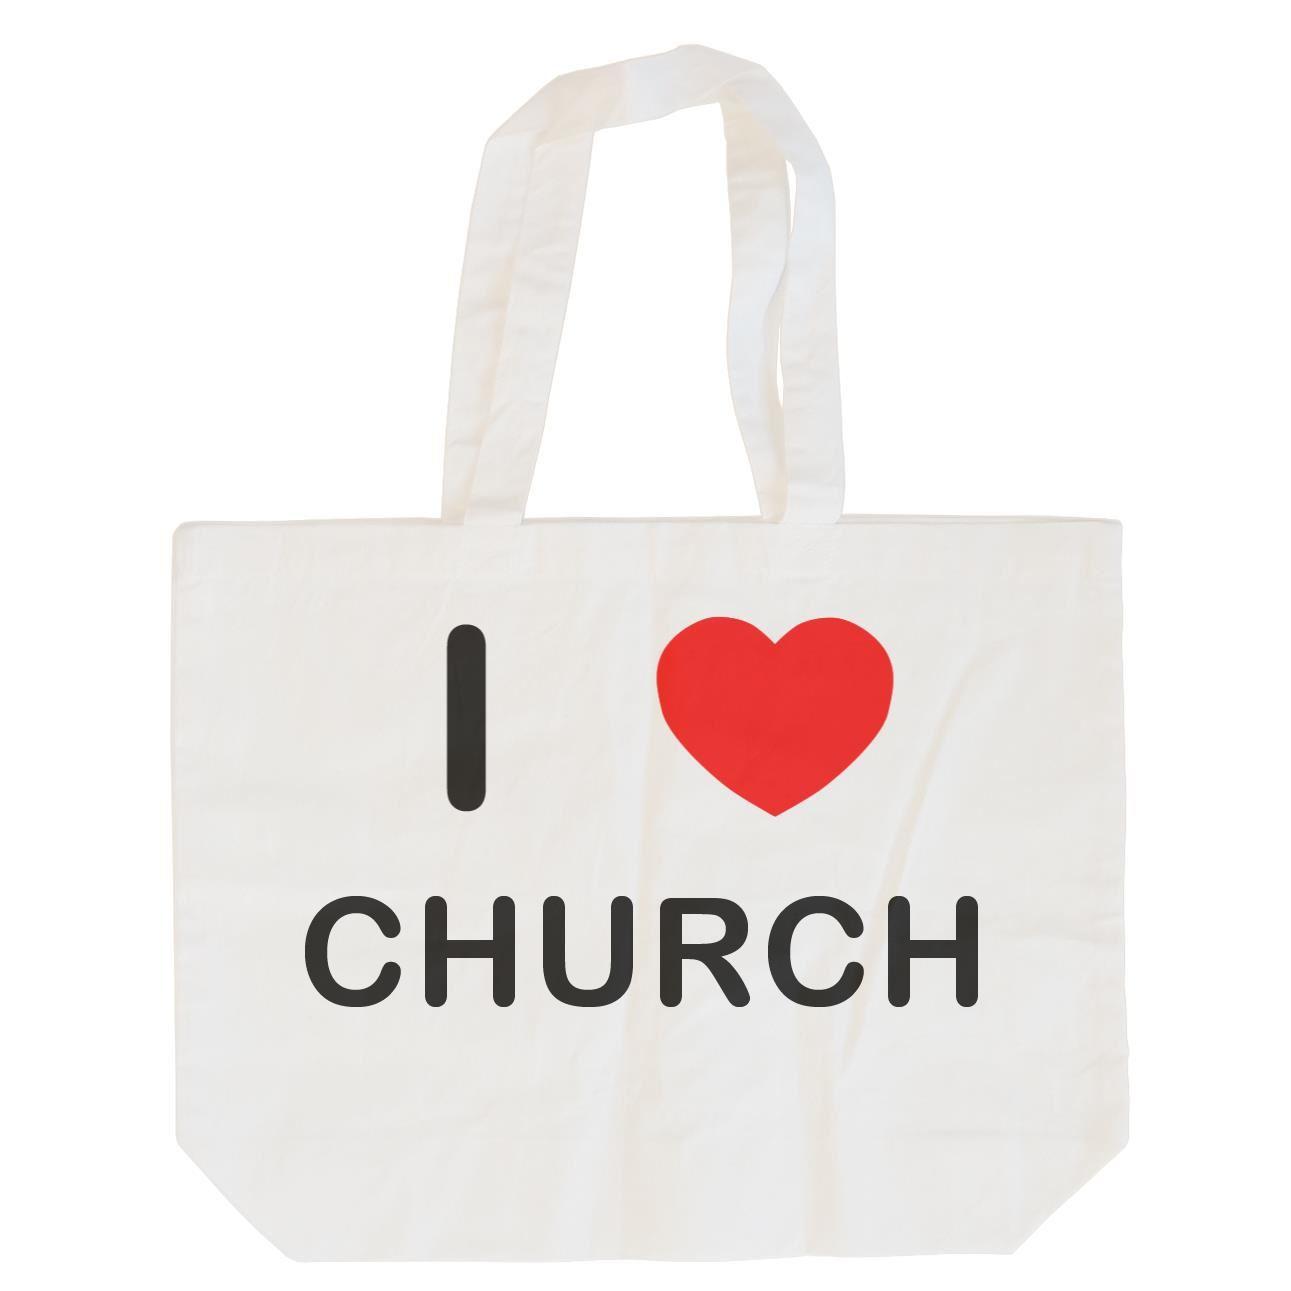 I Love Church - Cotton Bag | Size choice Tote, Shopper or Sling